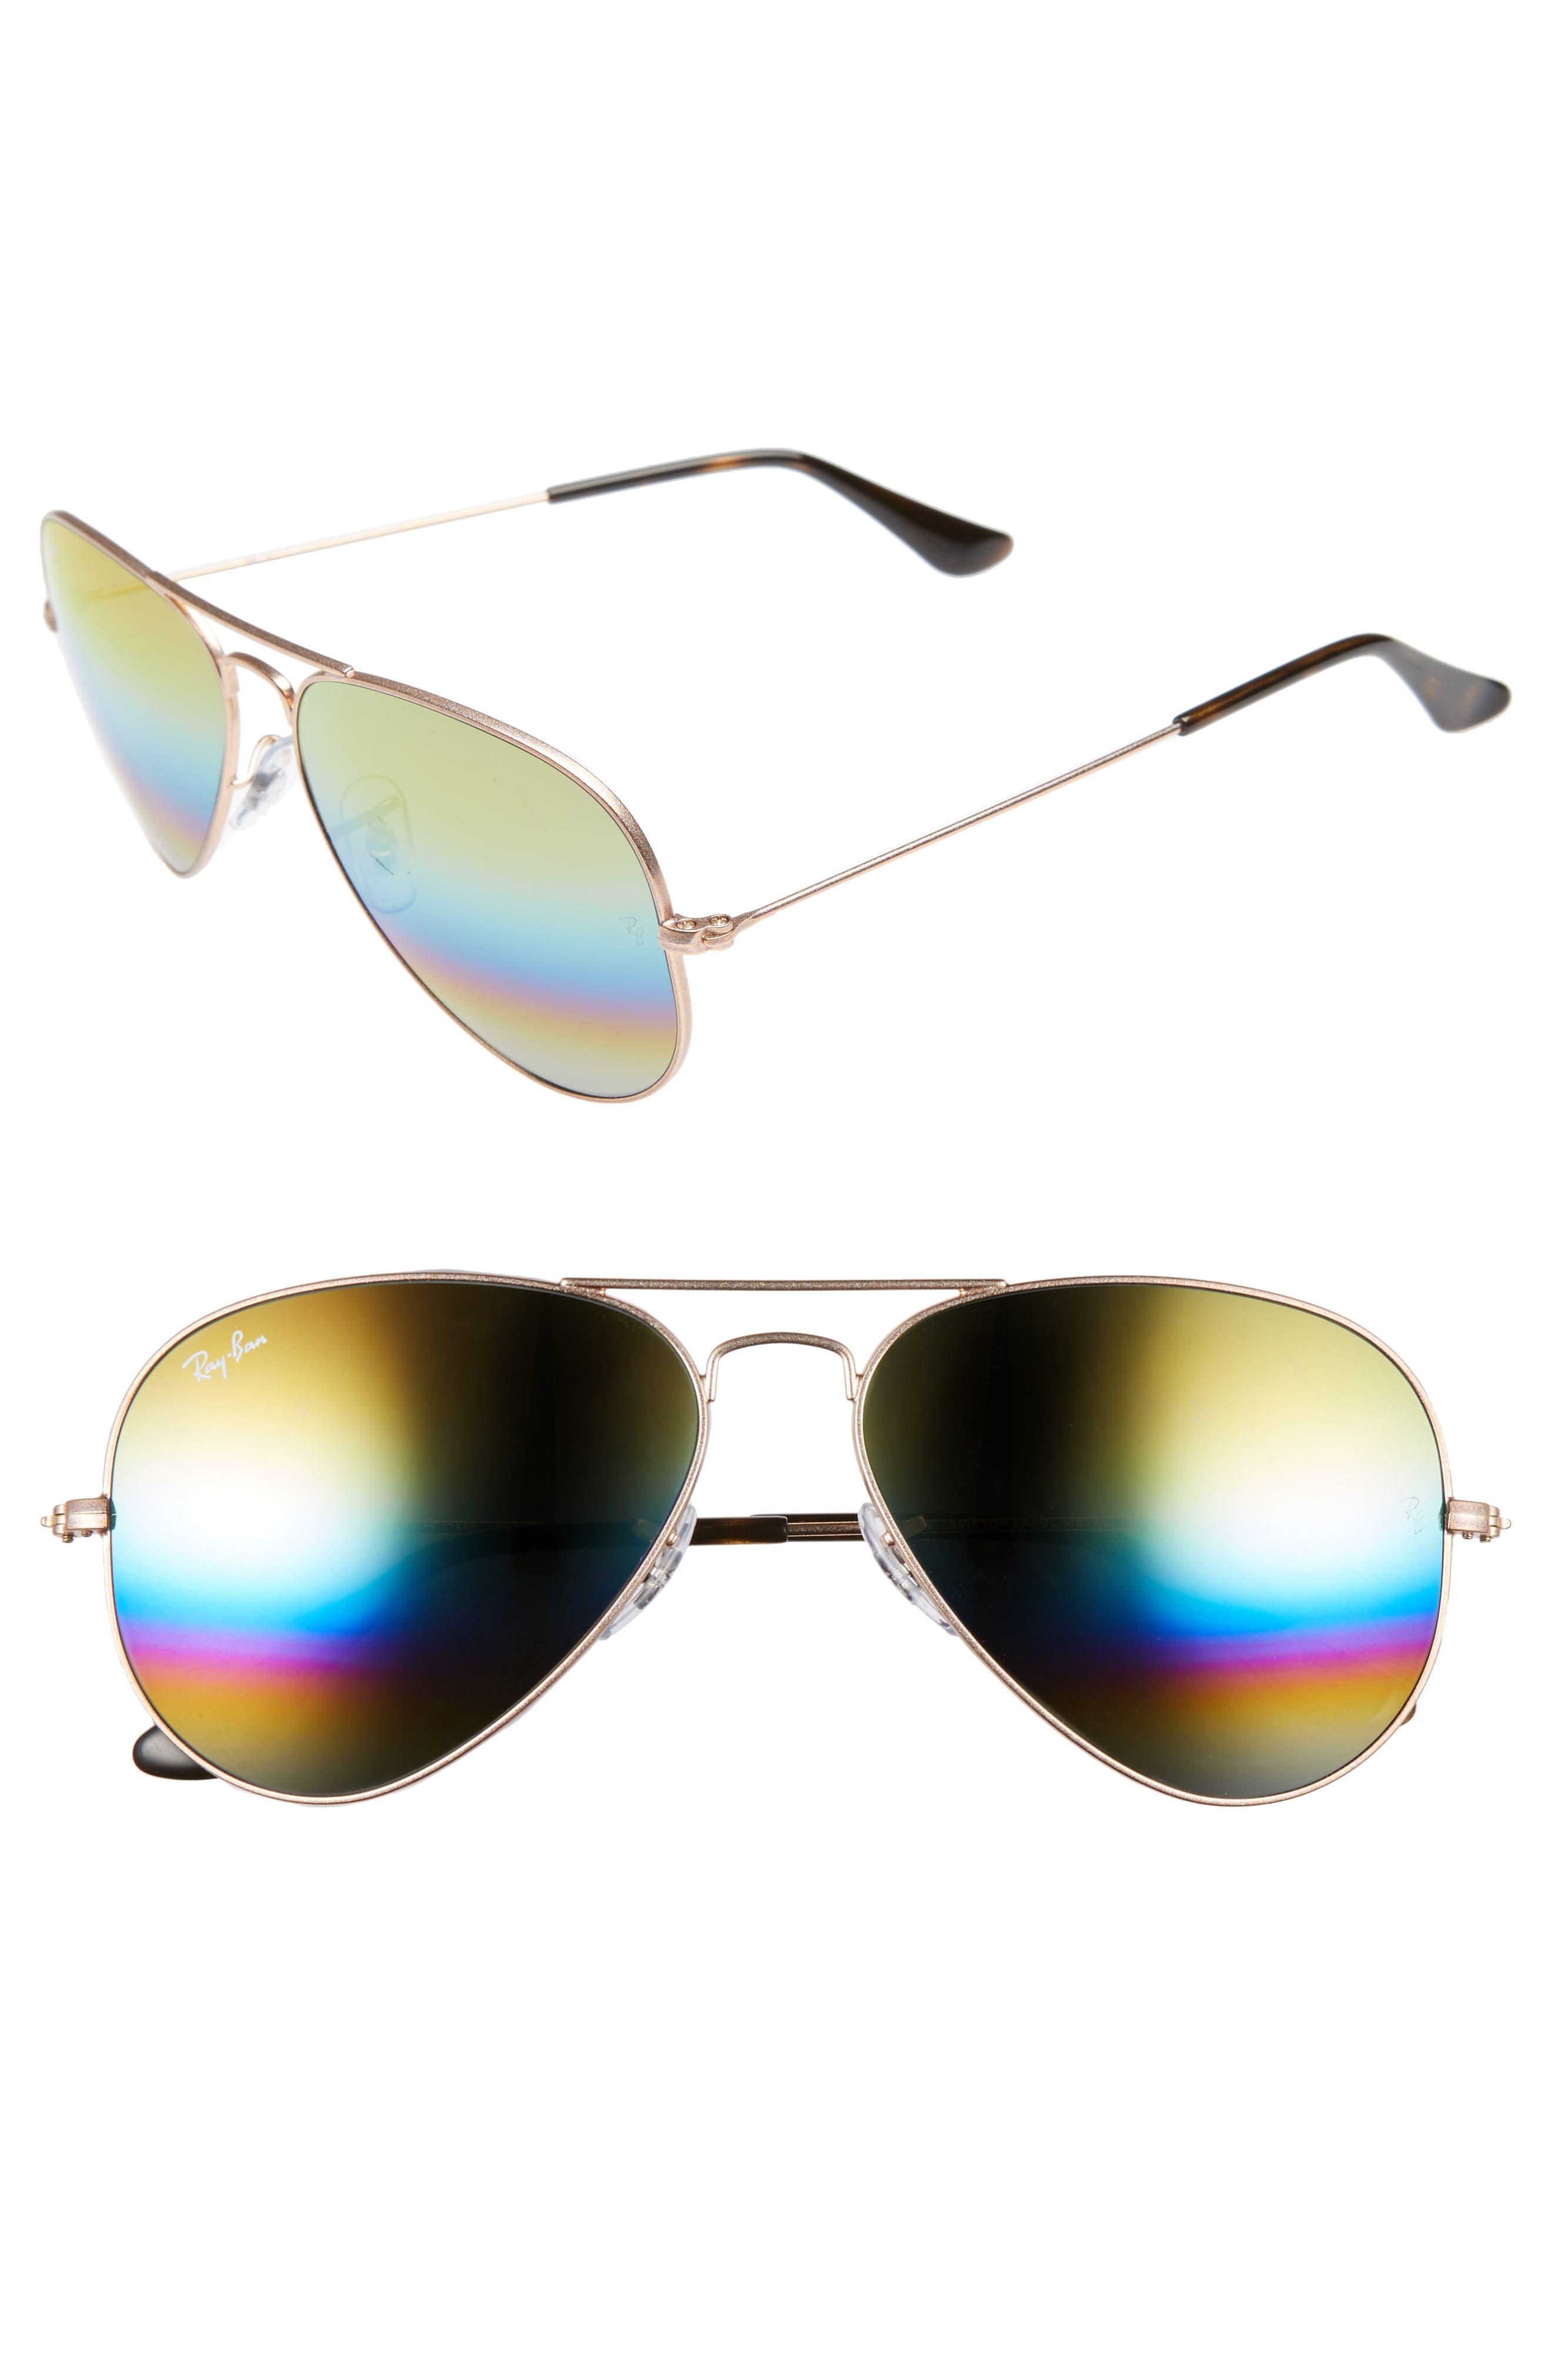 58mm Aviator Sunglasses,                             Main thumbnail 2, color,